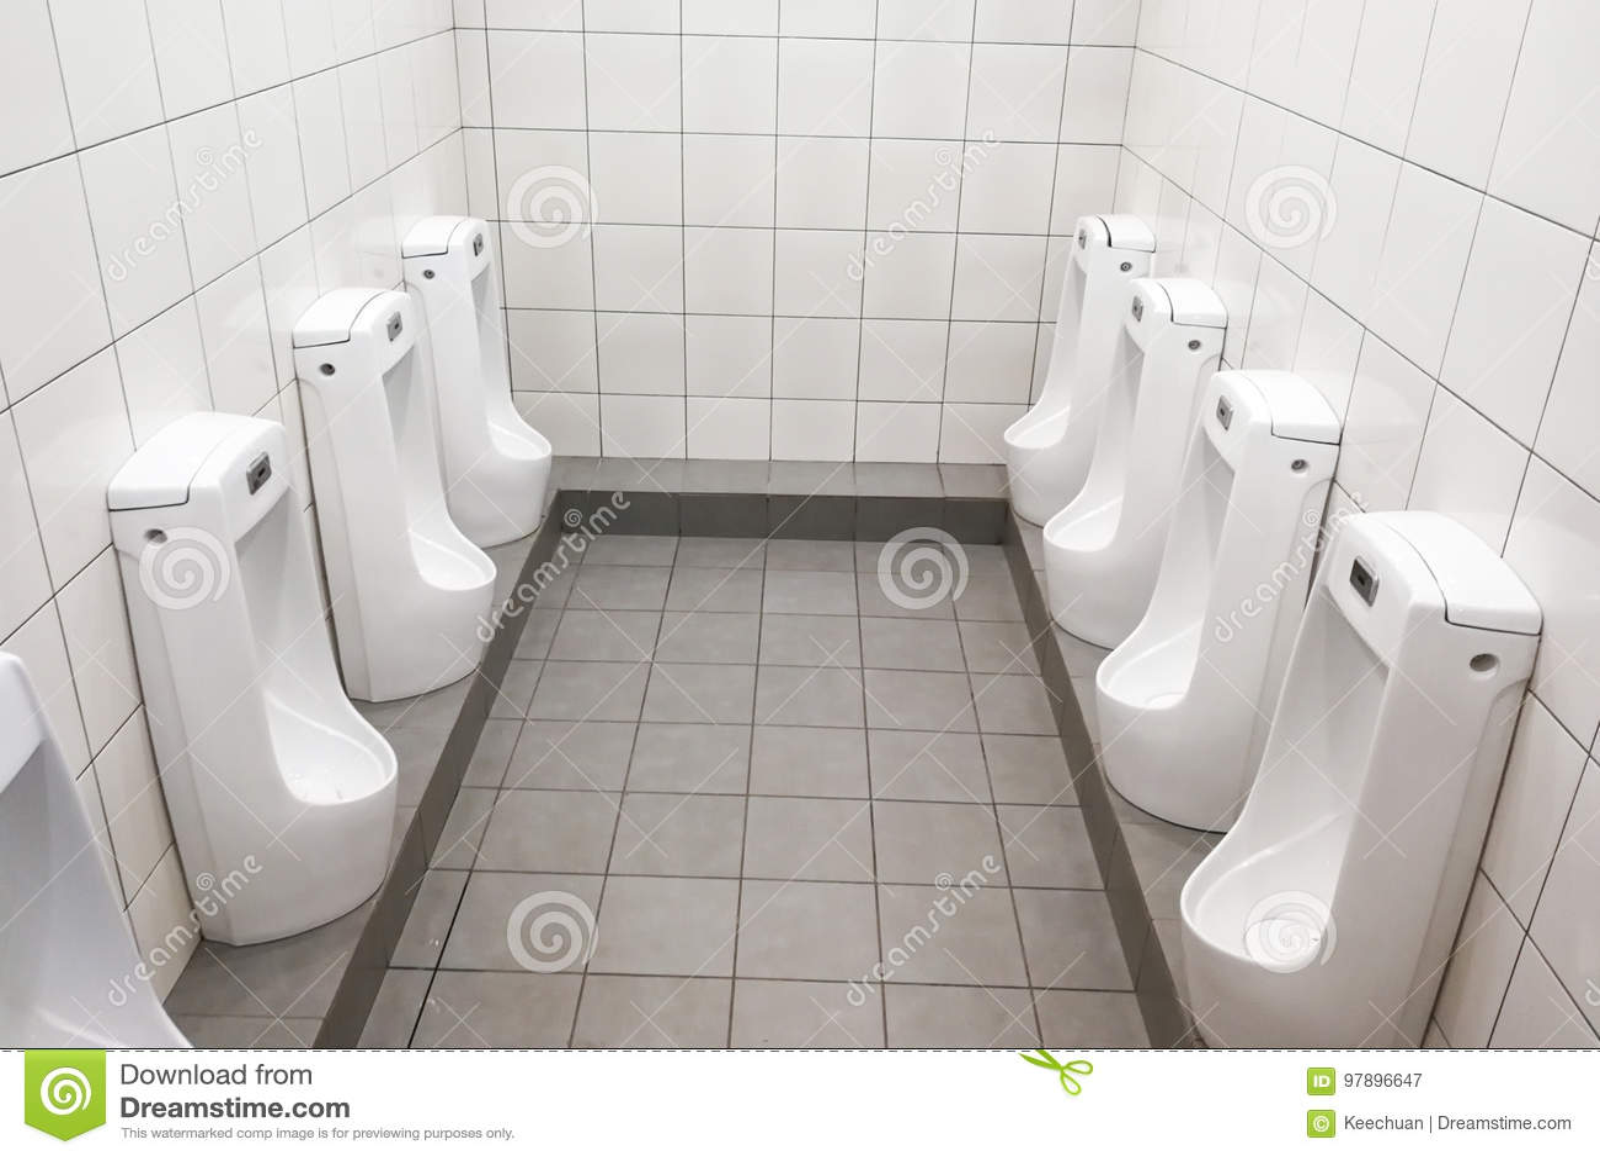 Modern Clean Hygienic Men Urinal Ware In Public Washroom Toilet ...